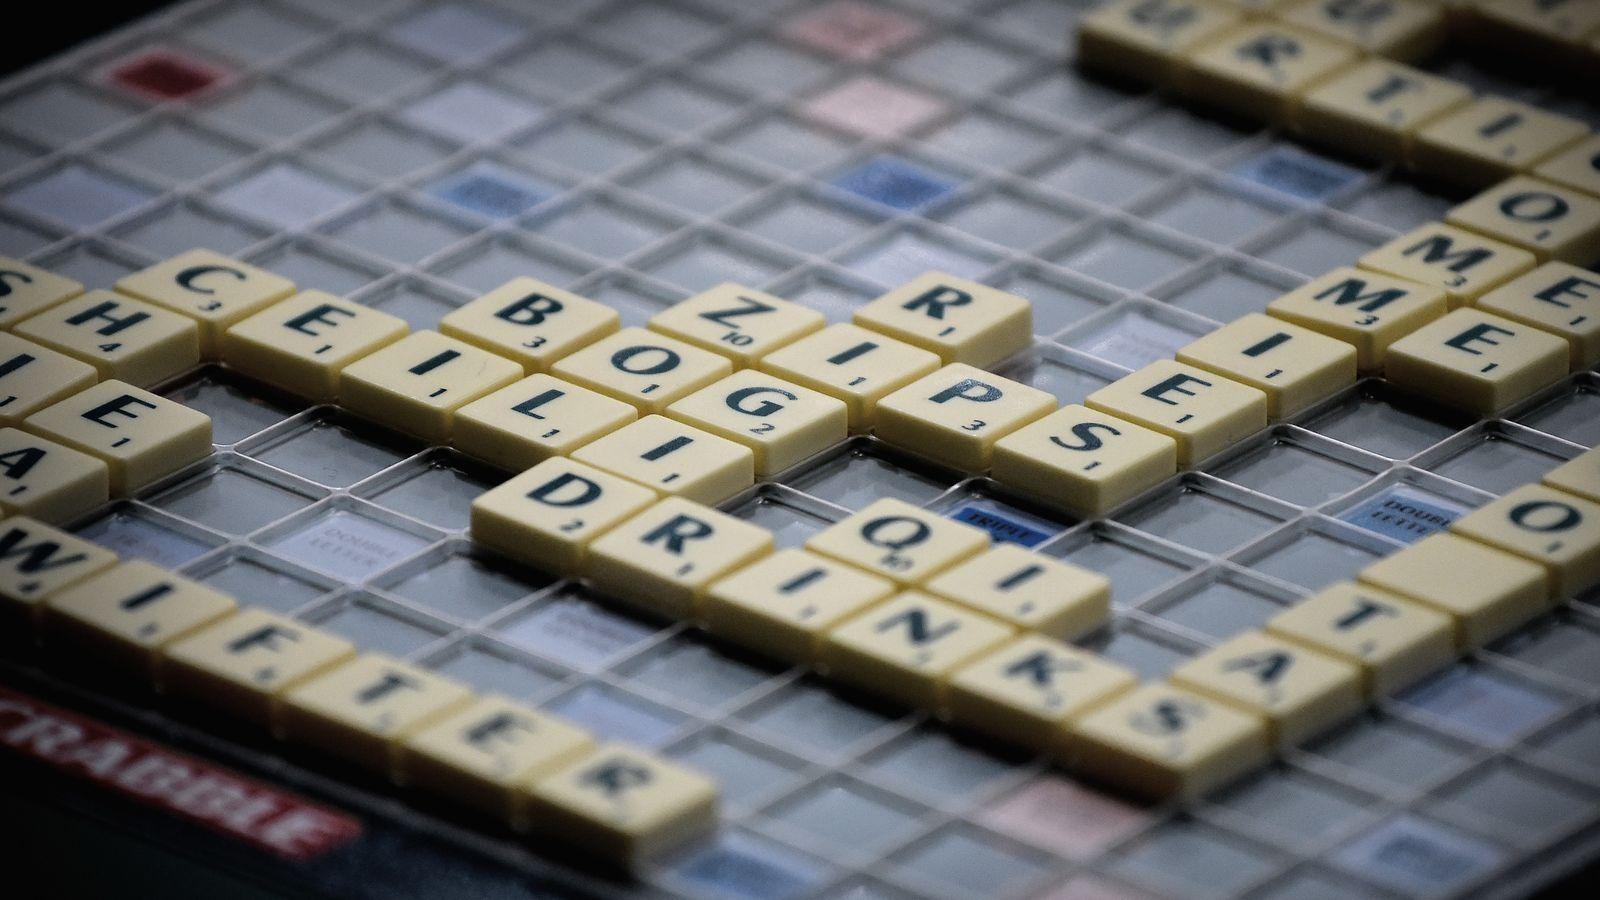 The Scrabble Bracket Scrabble, Lettering, Games